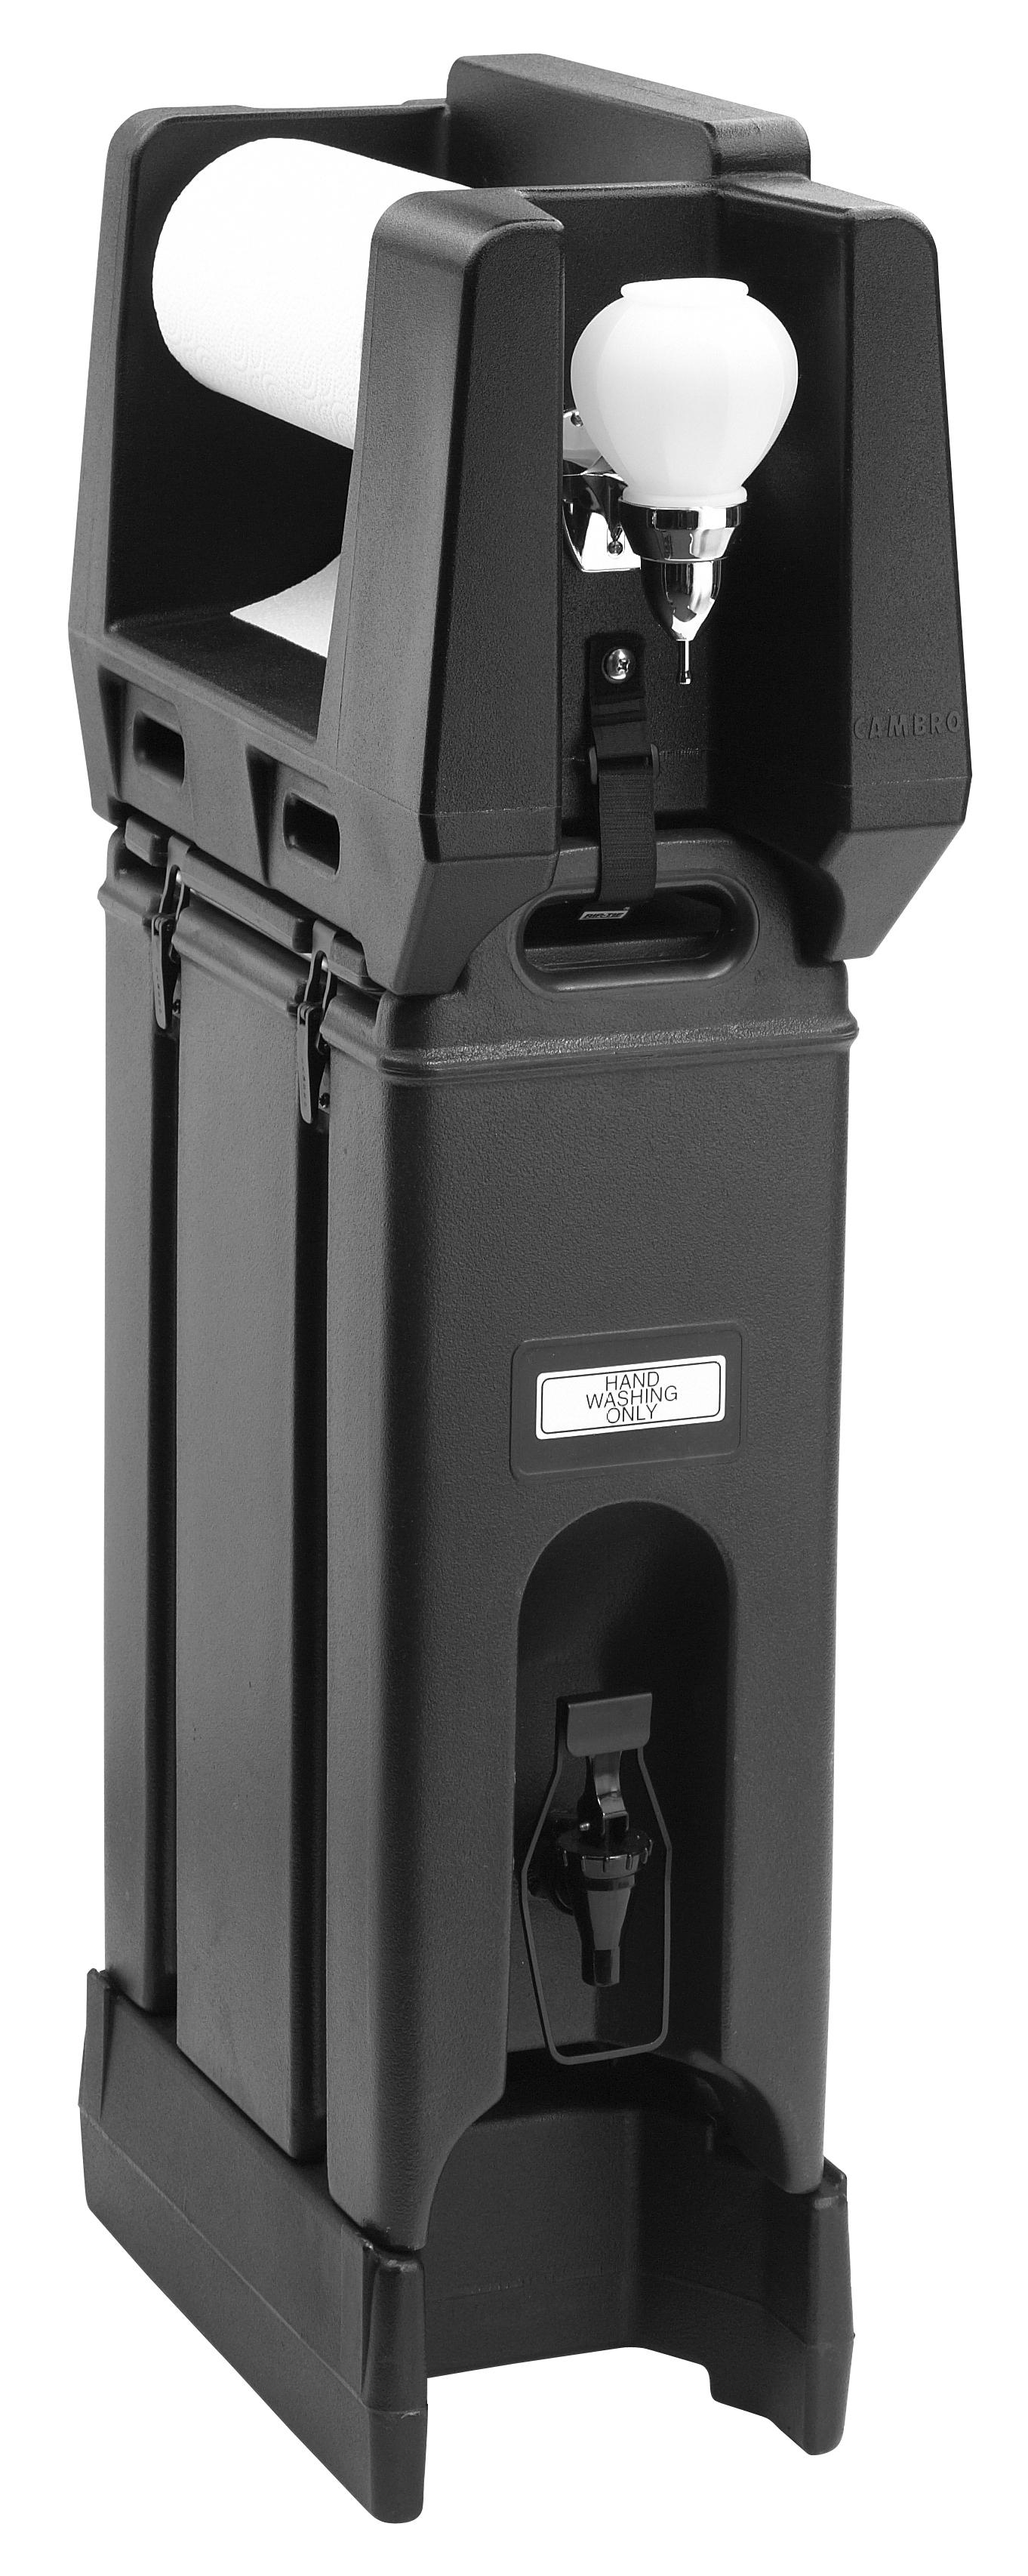 Cambro HWS31110 handwashing